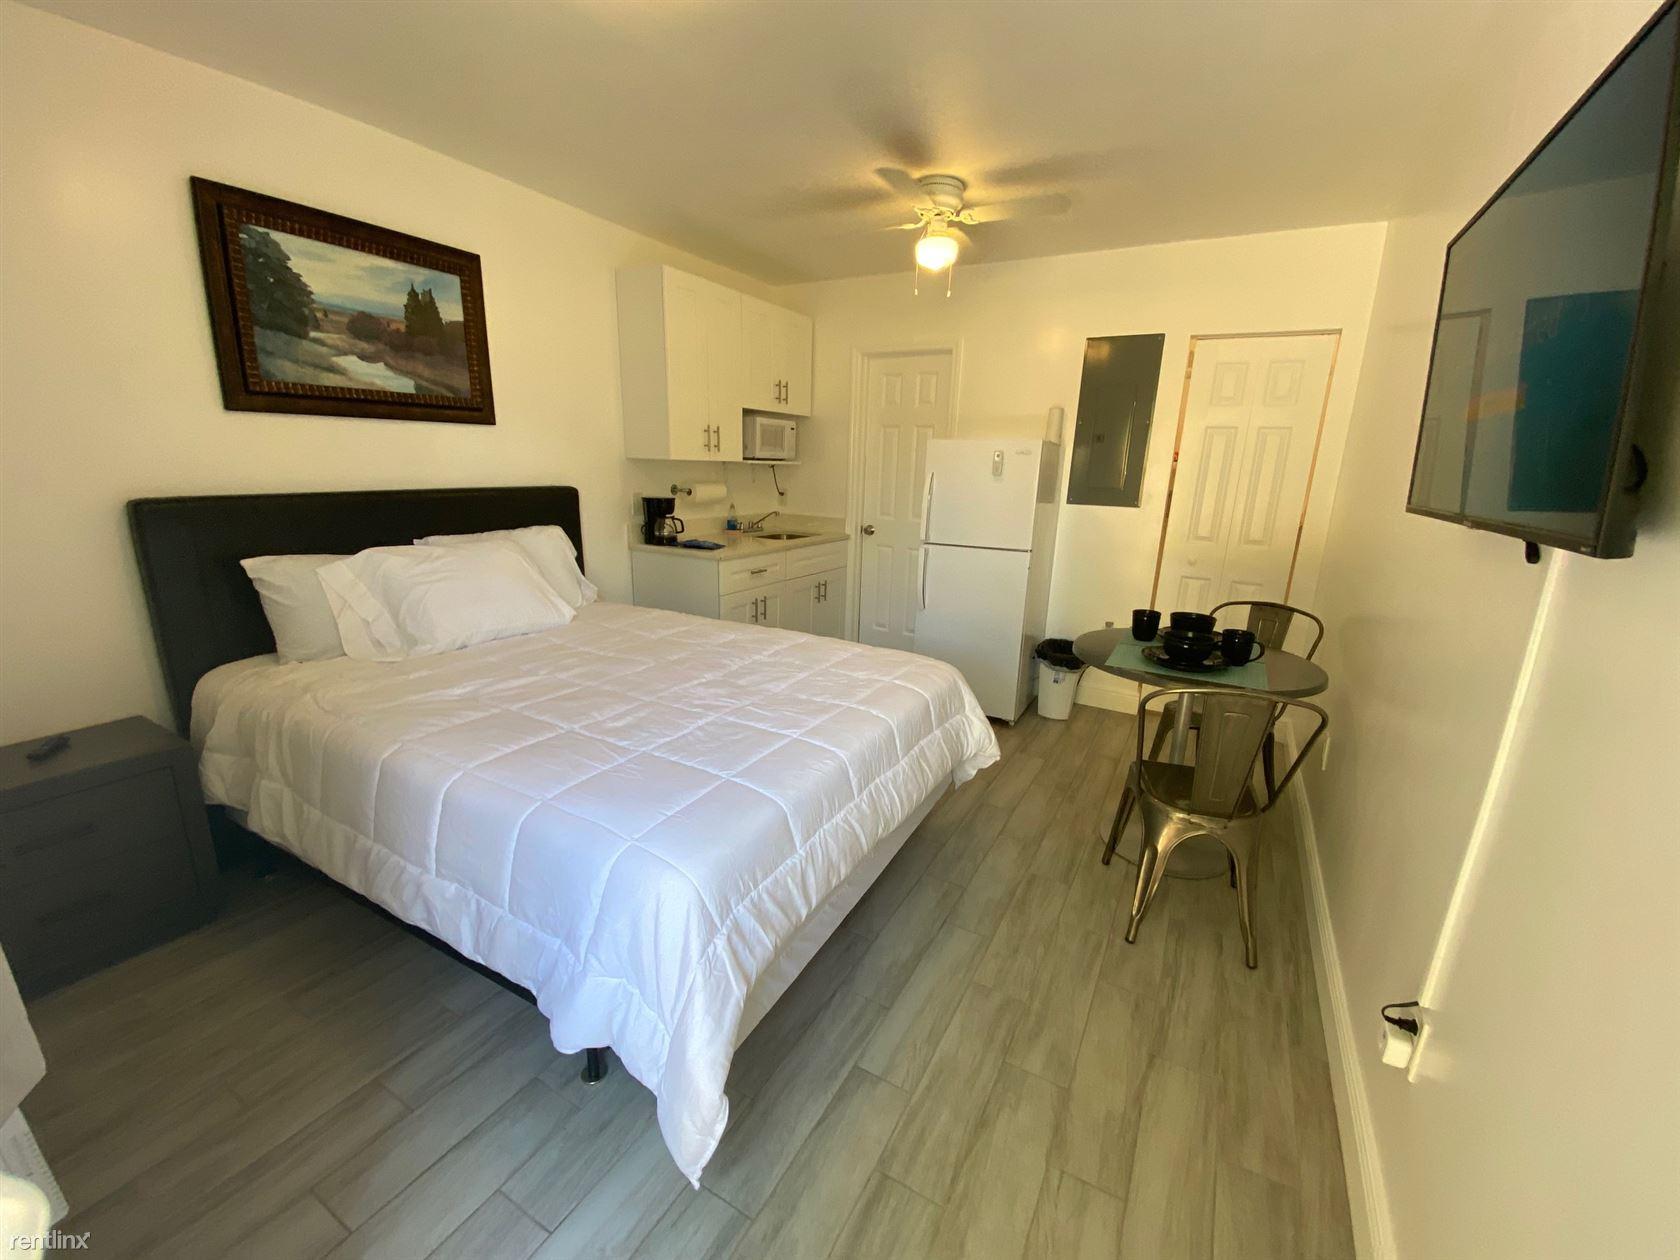 916 N Victoria Park Rd Apt 3, Fort Lauderdale, FL - $1,275